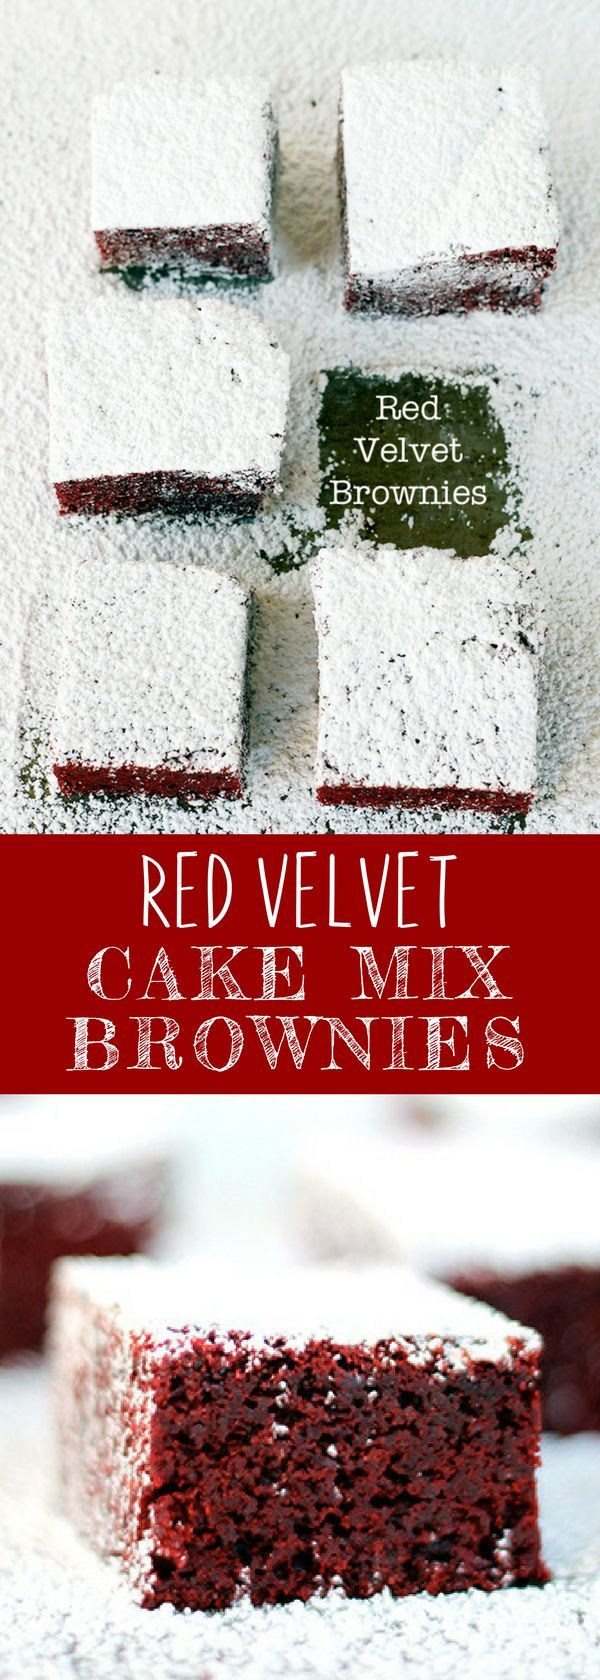 Red Velvet Cake Mix Brownies